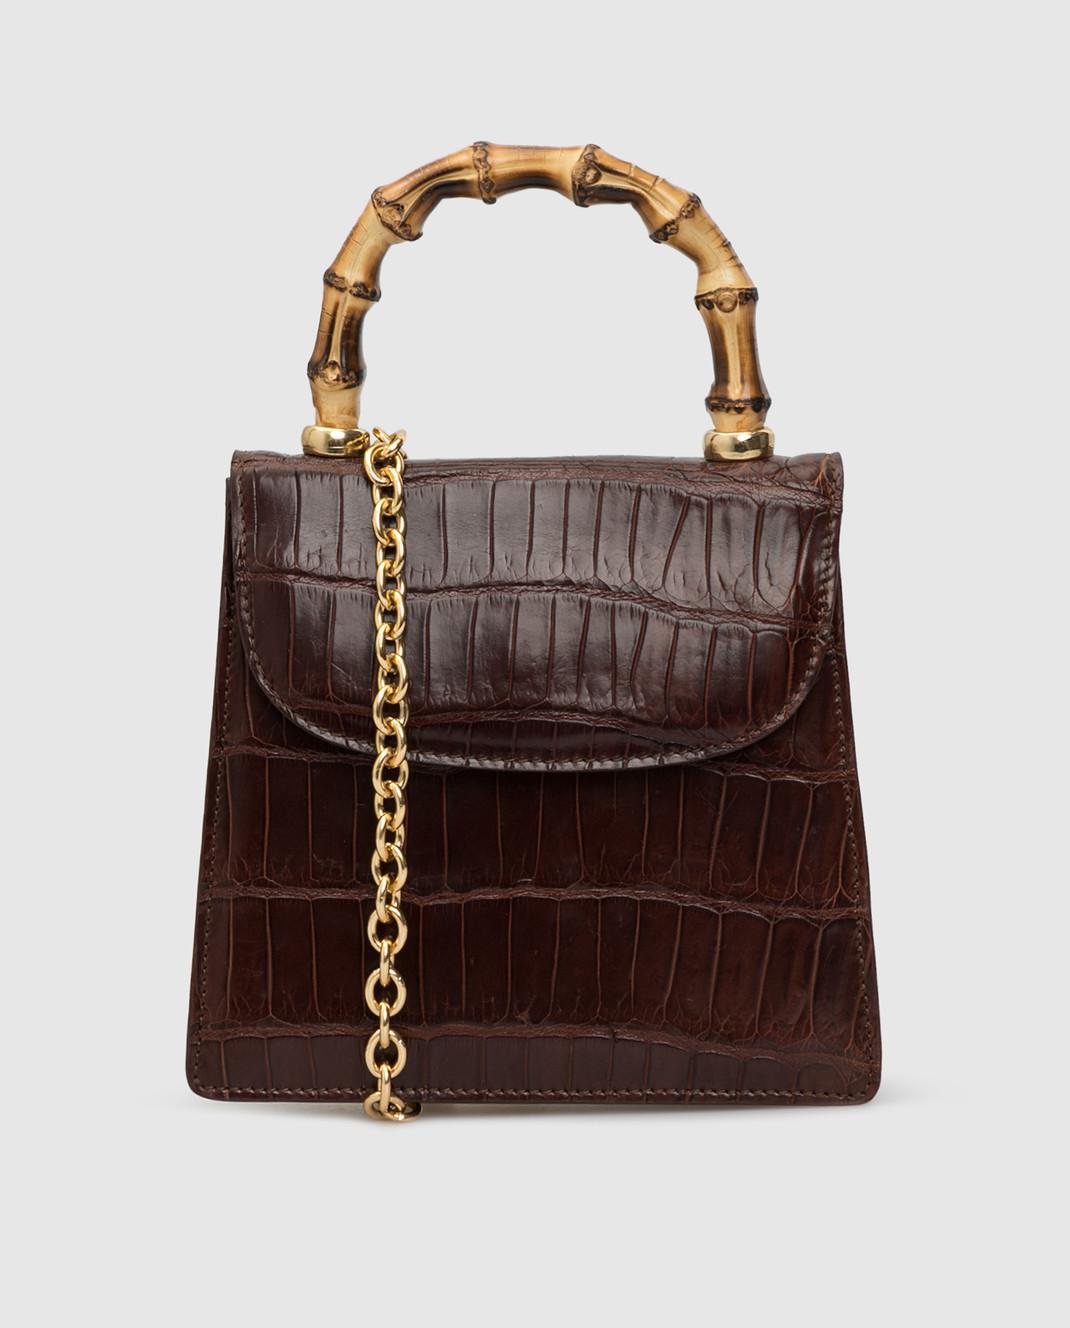 Bochicchio Коричневая сумка из кожи крокодила CROCOCLUTCH4